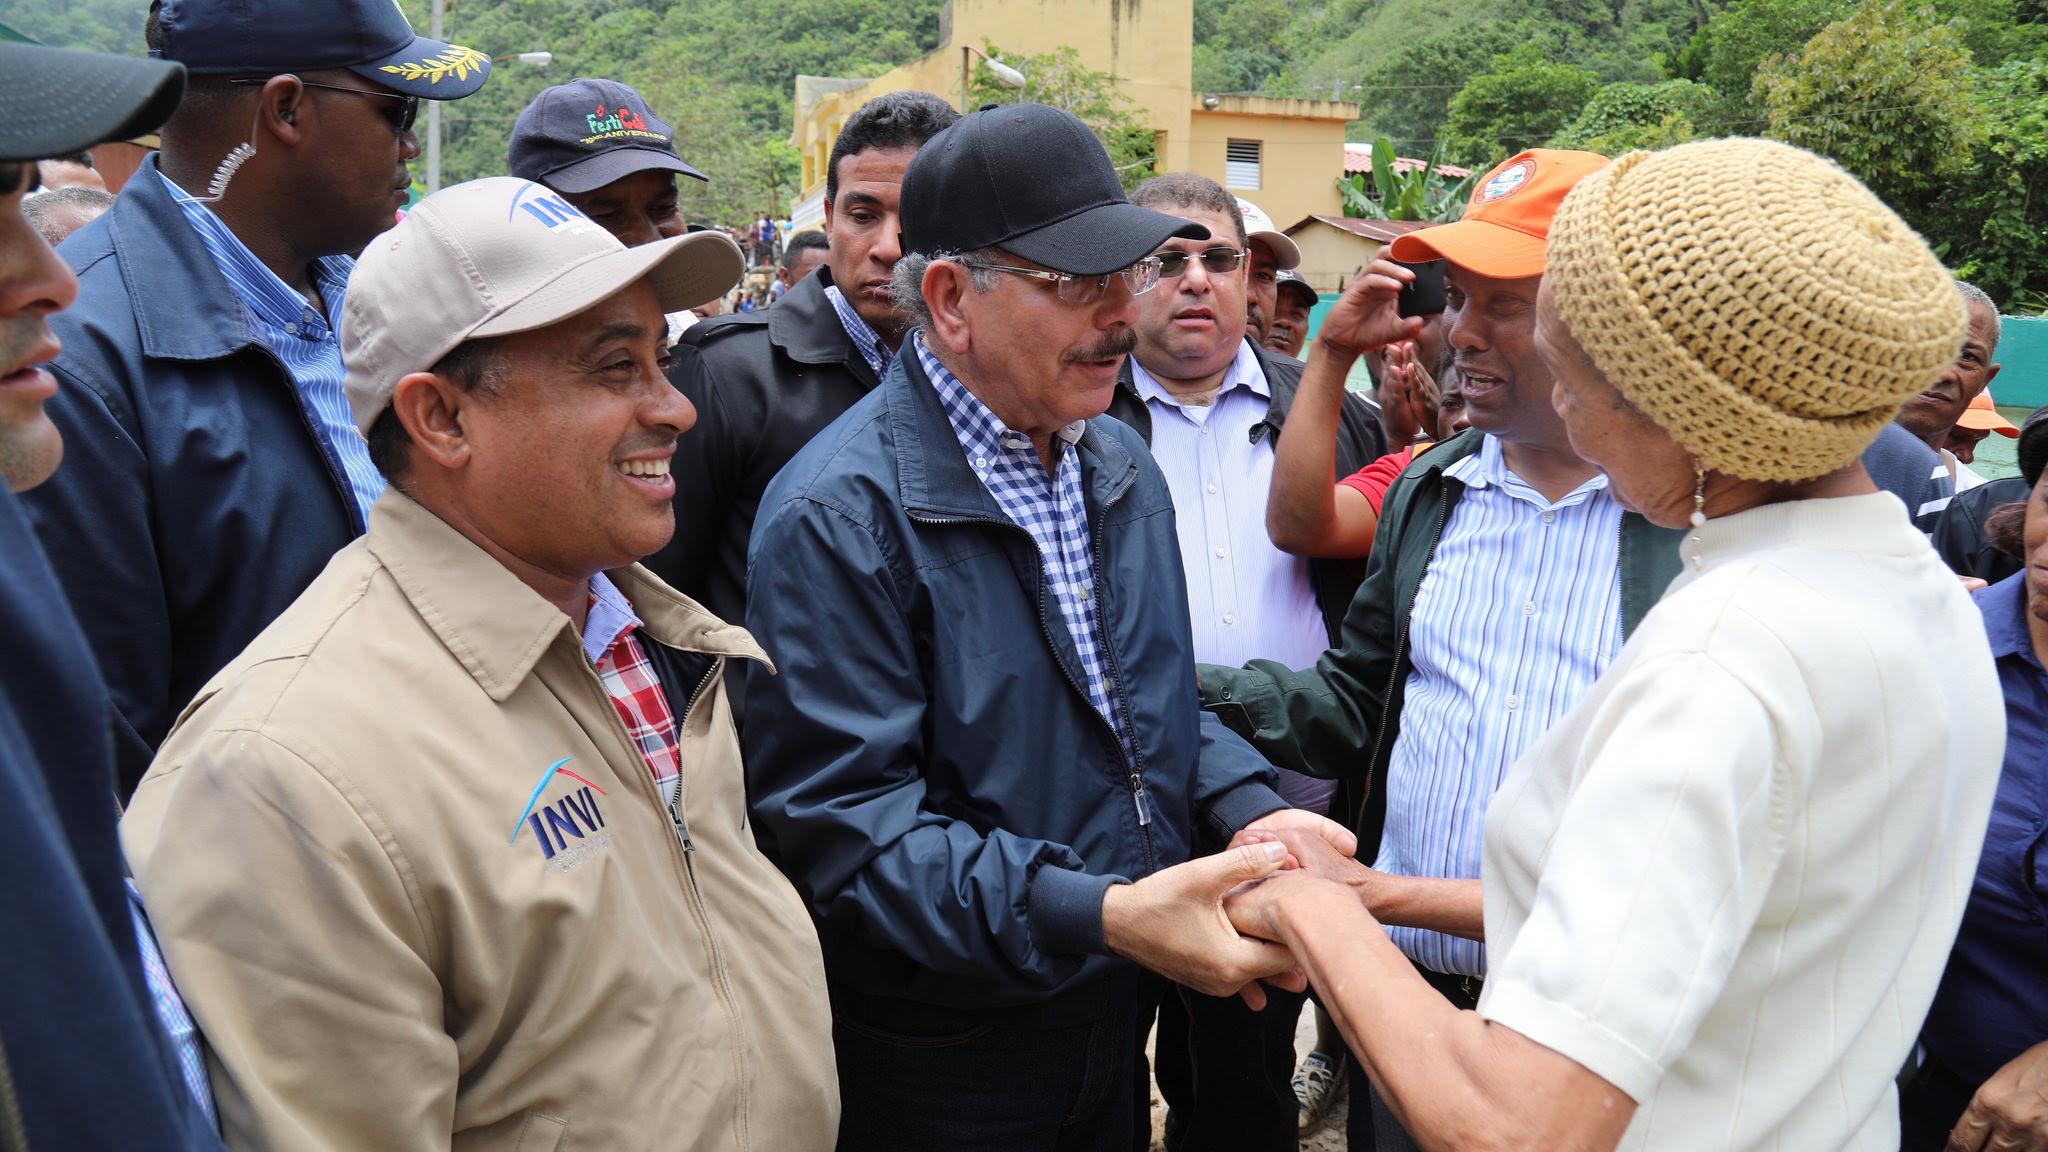 X Danilo MedinaX recorrióX asistencia